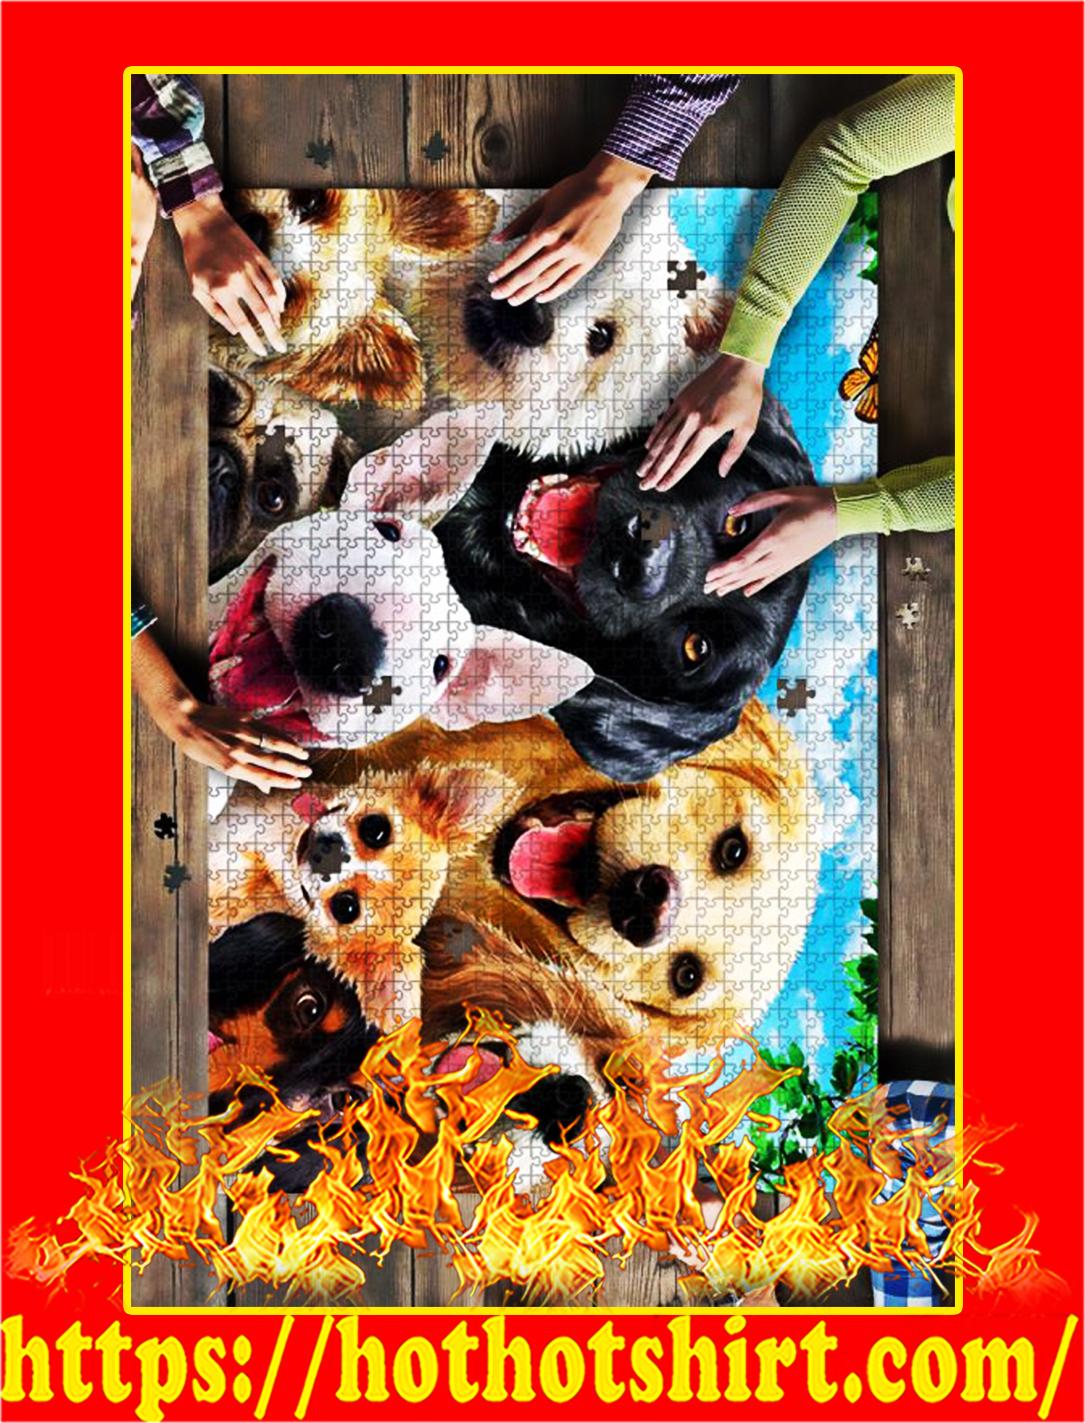 Dog Selfie Jigsaw Puzzle - 1000 pieces